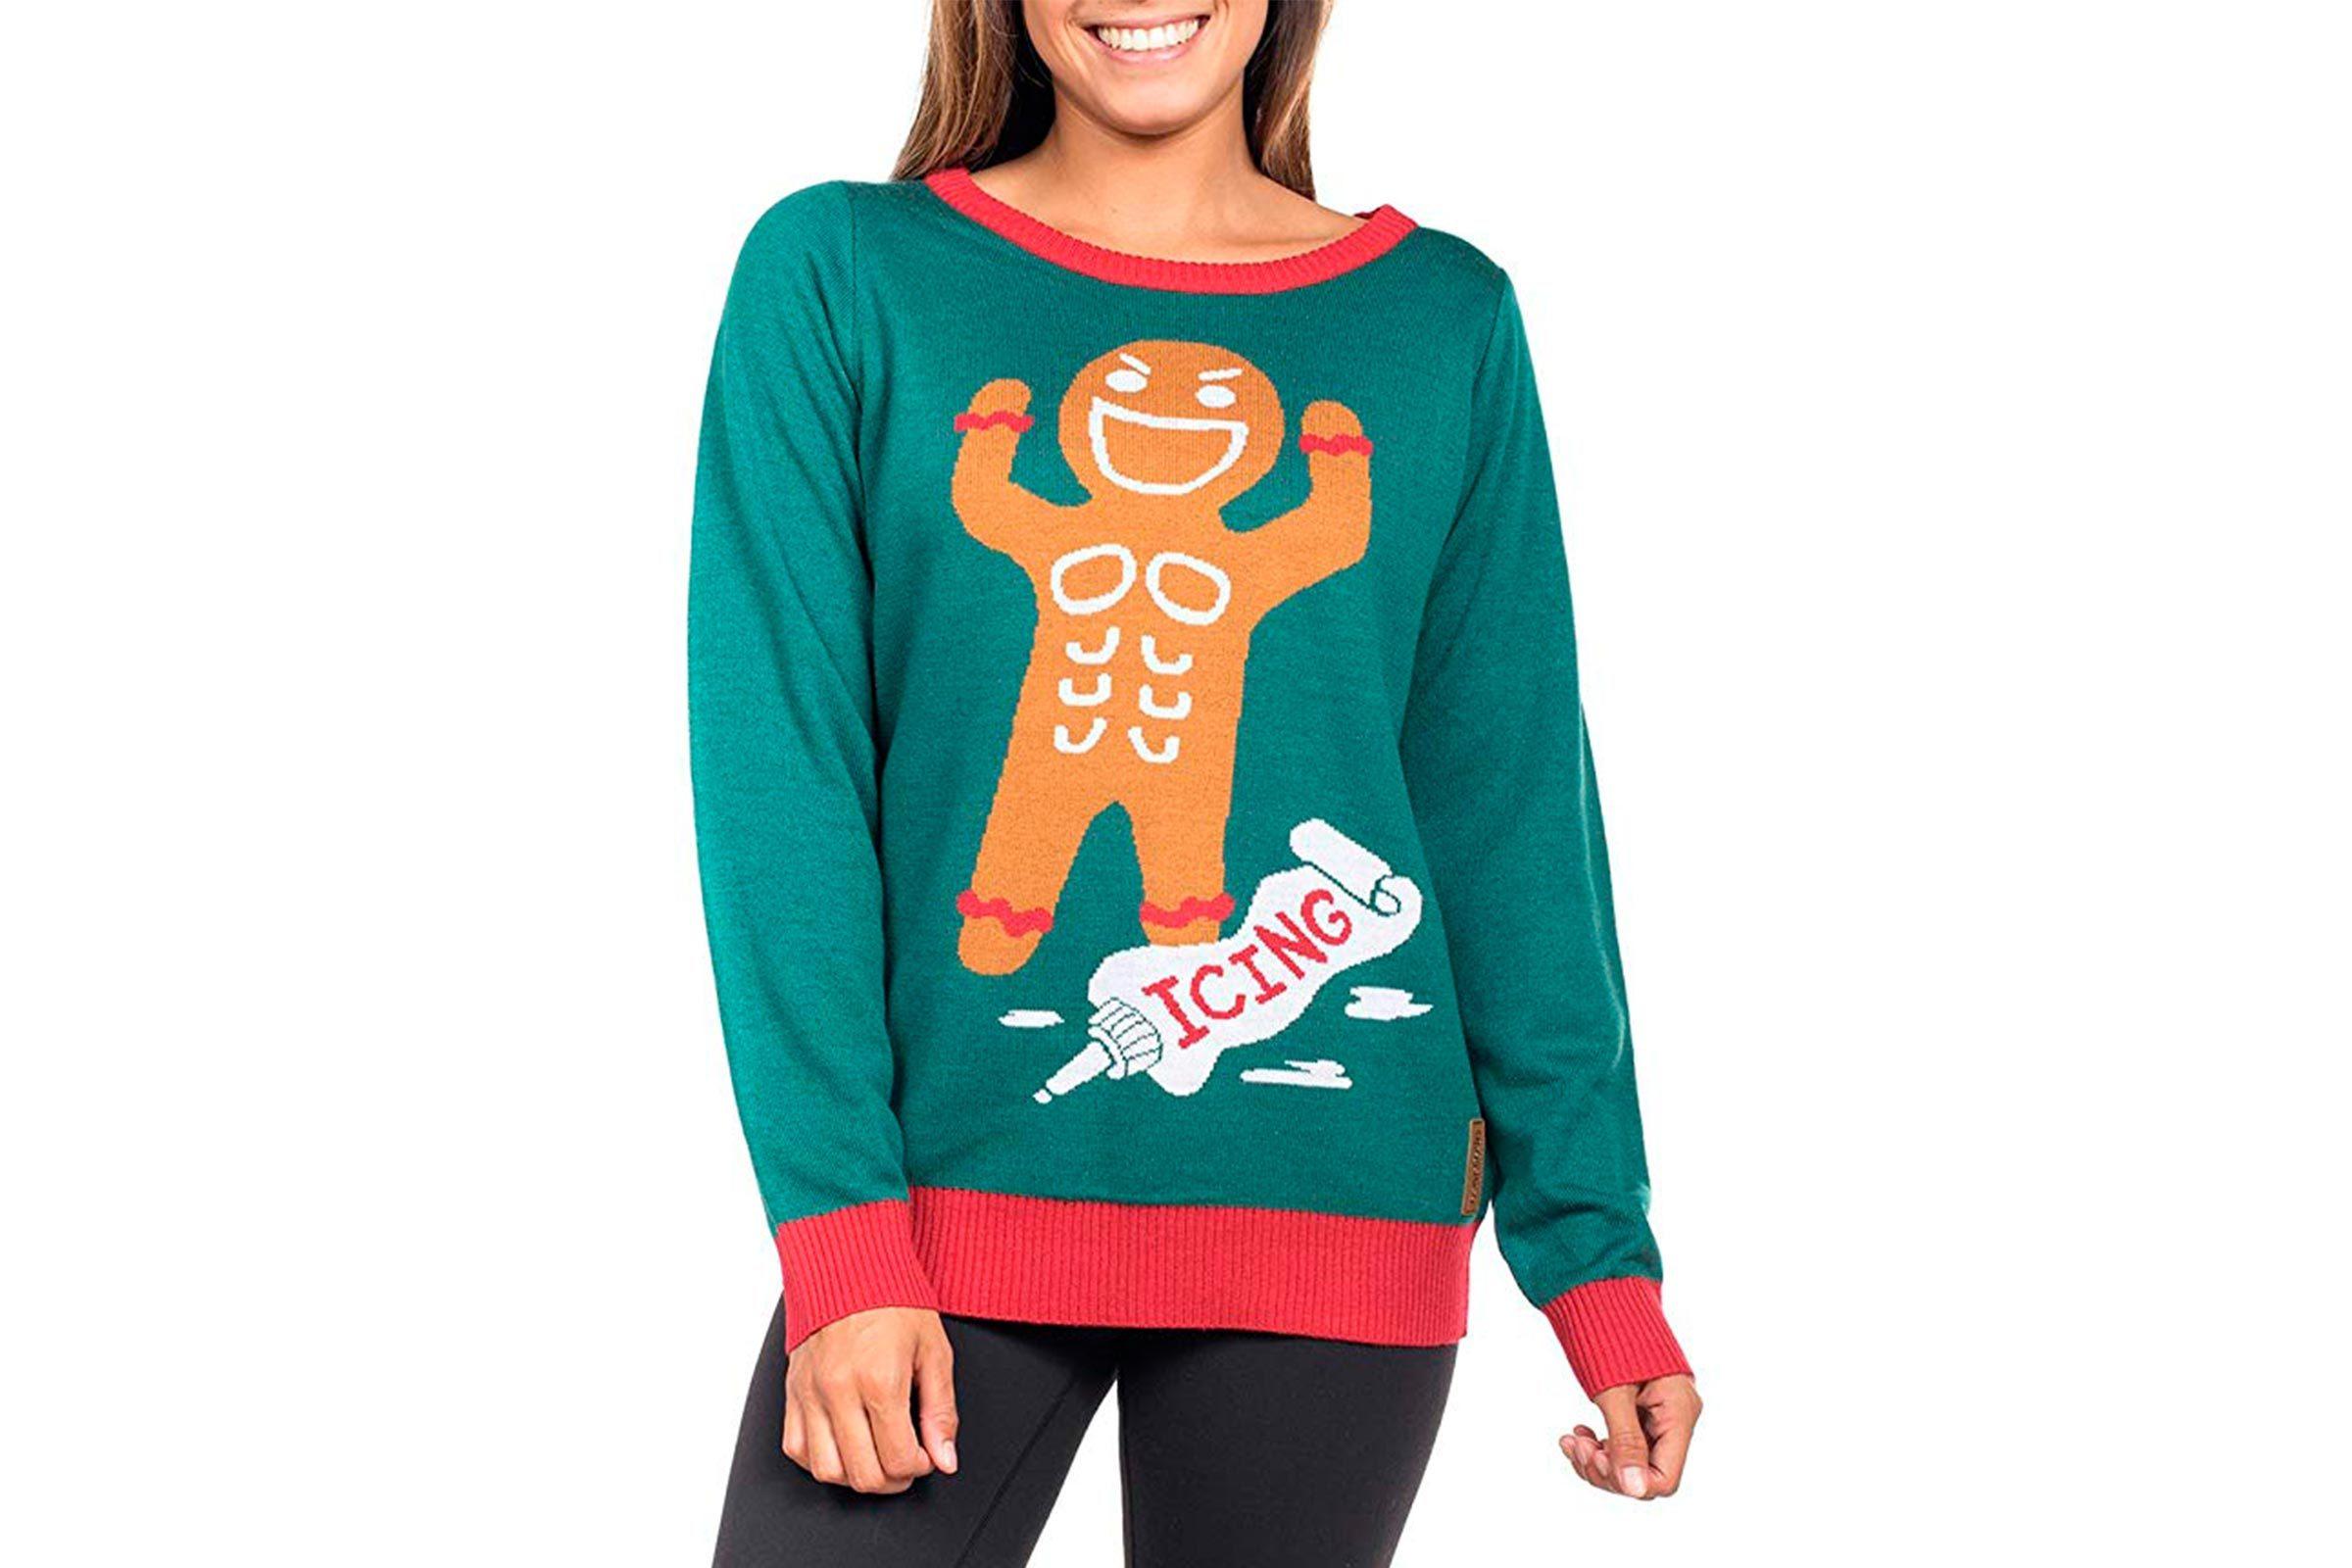 Gingerbread man Christmas sweater